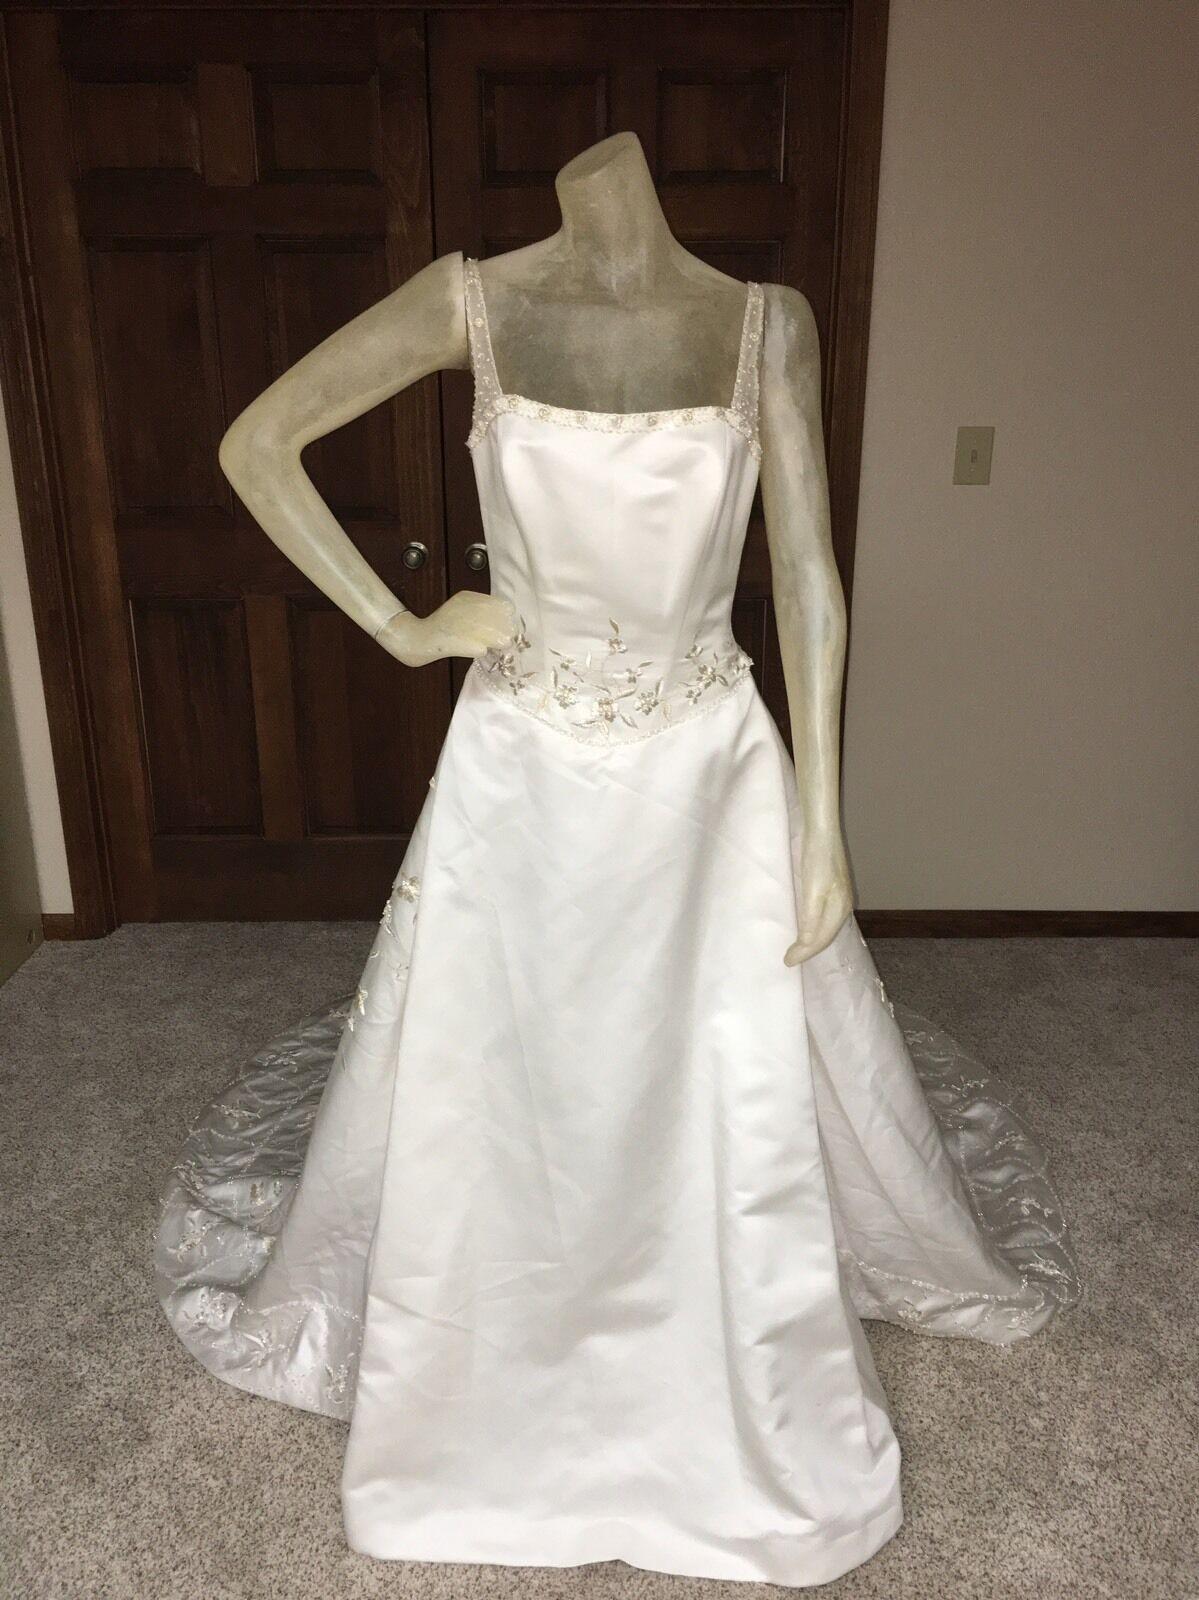 Zurc for Impression Wedding Dress Größe 12 damen Ivory Beaded detachable Train